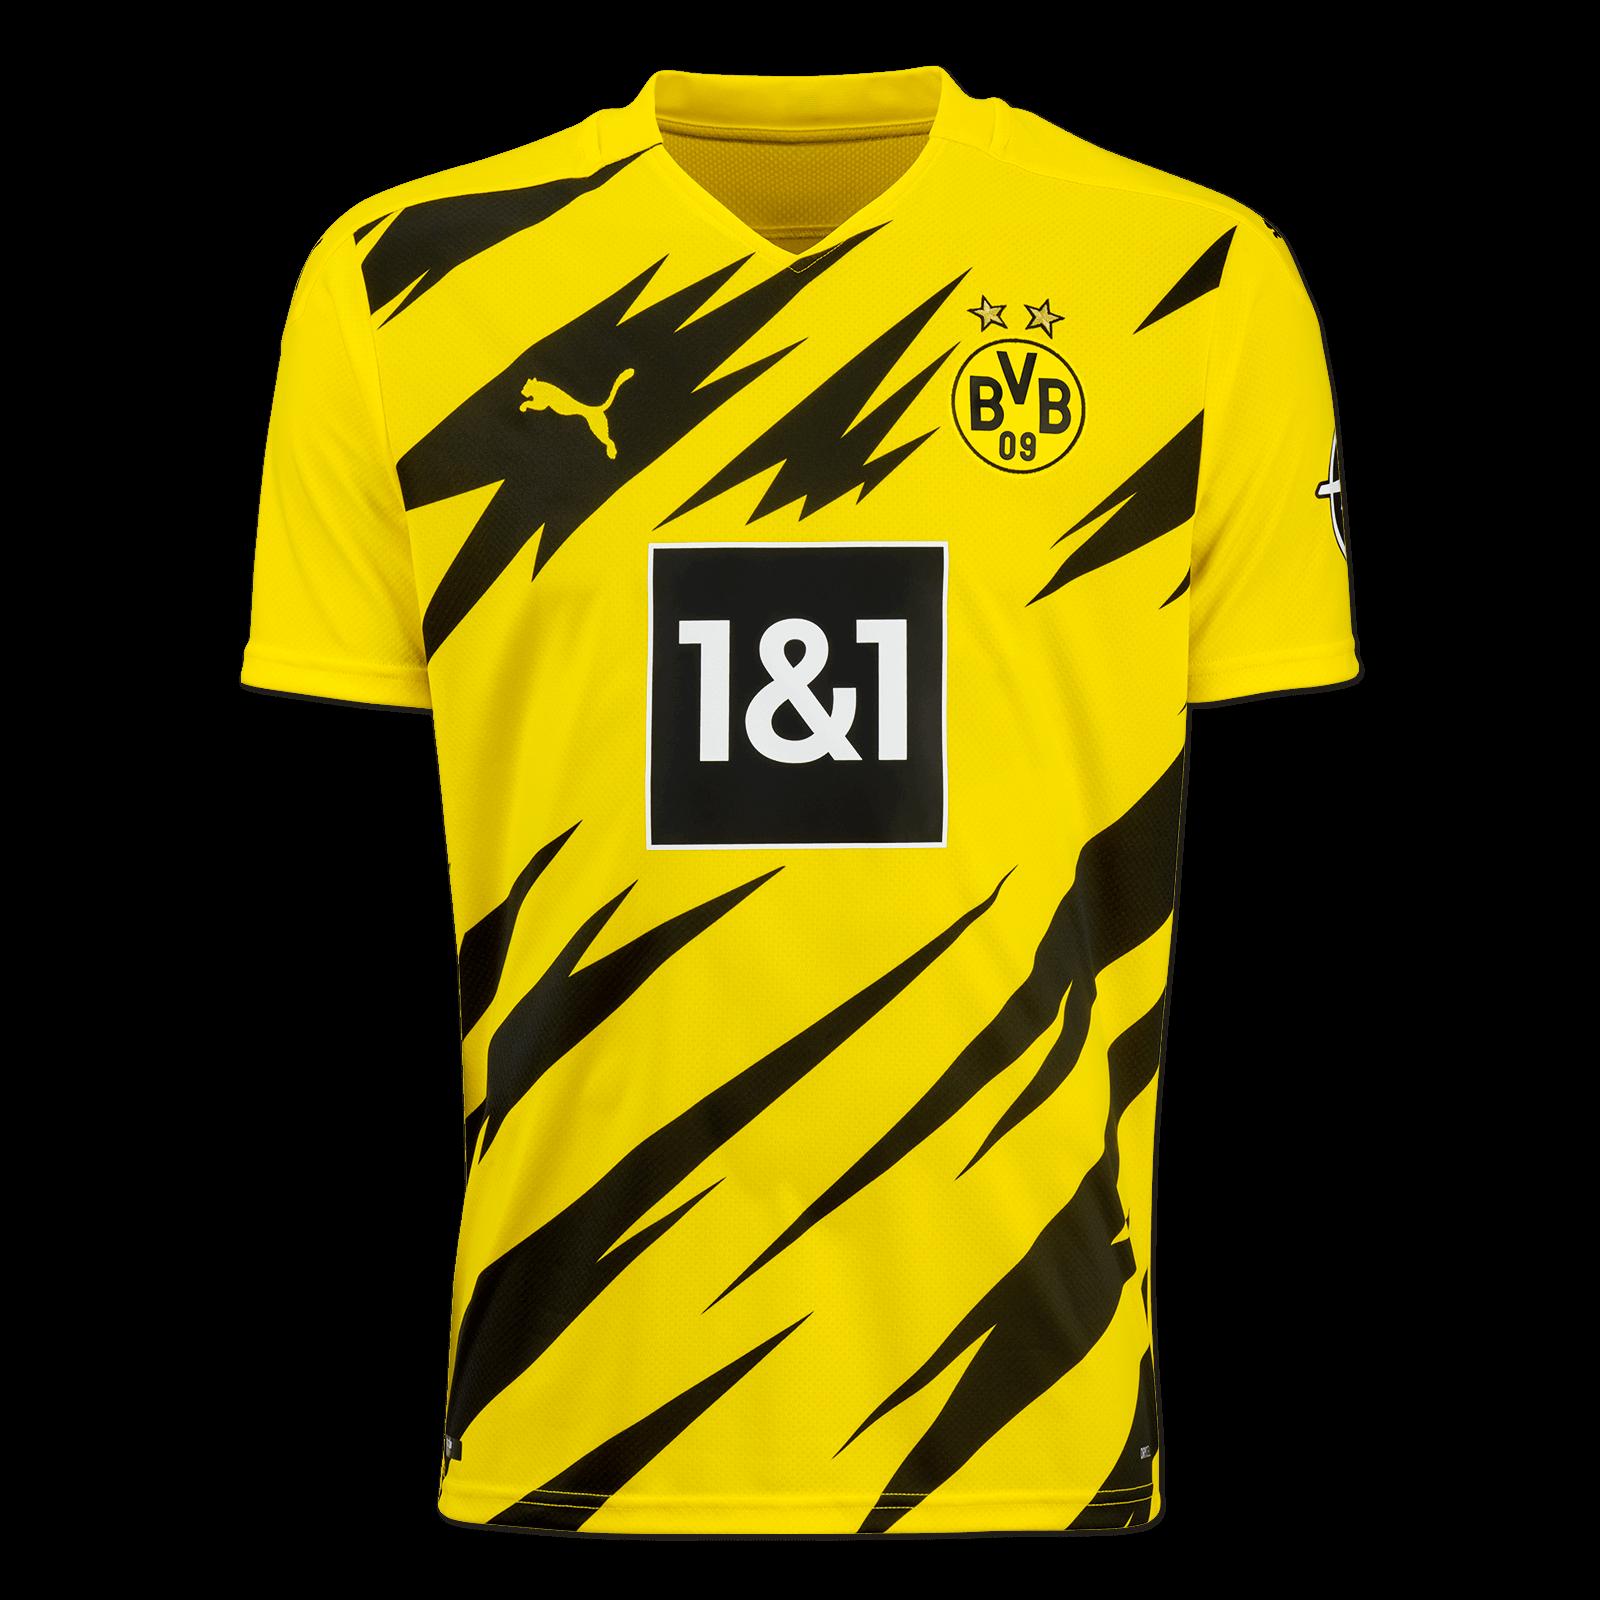 VVANESSAA Saison 2019//20 Heim und Ausw/ärts Borussia Dortmund Fussball Trikot /& Shorts /& Socken #19 Julian Brandt Fu/ßball Trikot f/ür Kinder Herren Erwachsen